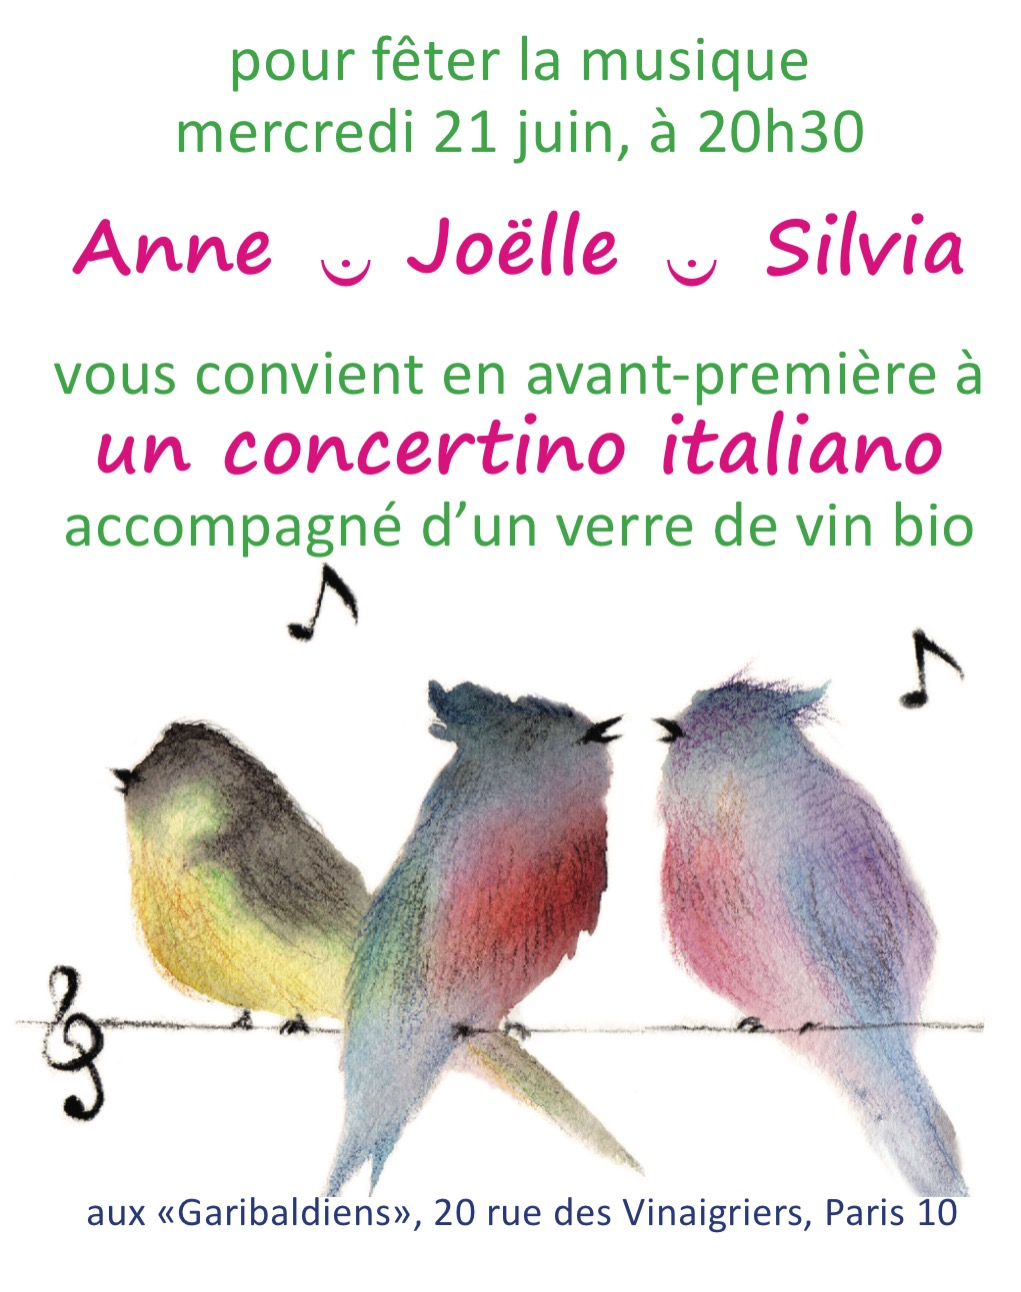 La Fete de la musique aux GARIBALDIENS avec Silvia MALAGUGINI